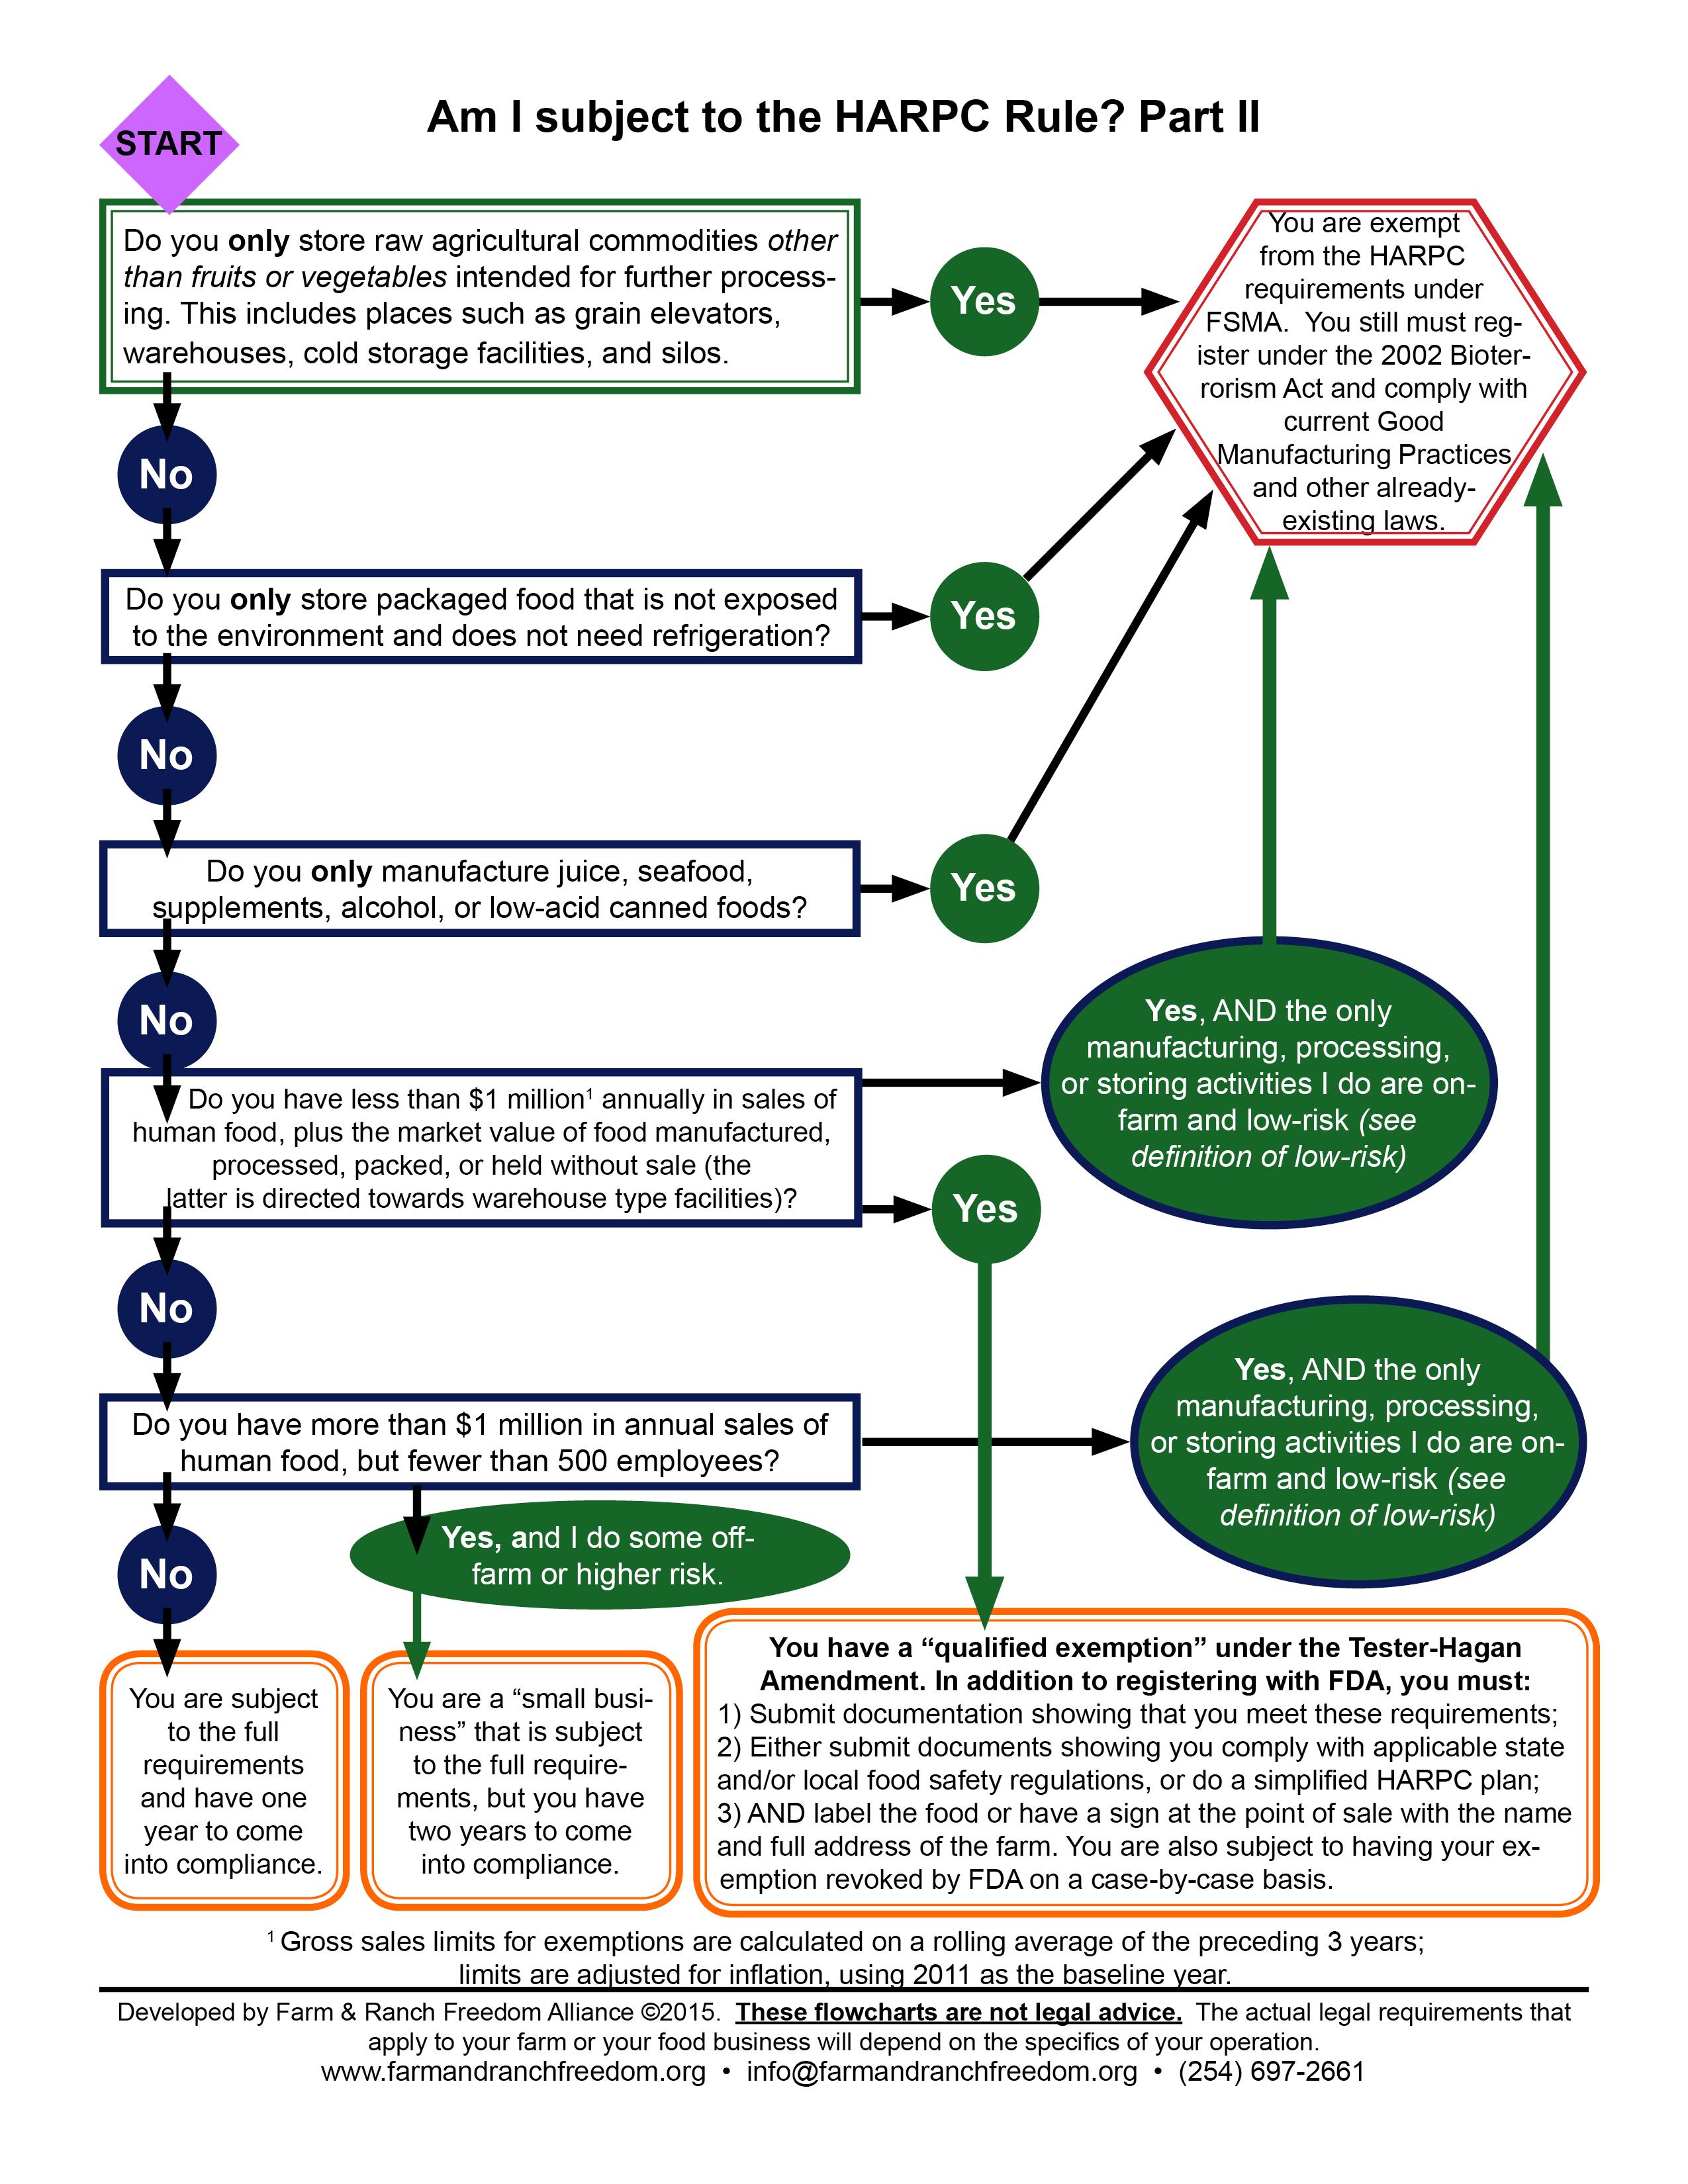 Federal Food Safety Modernization Act Farm And Ranch Freedom Alliance